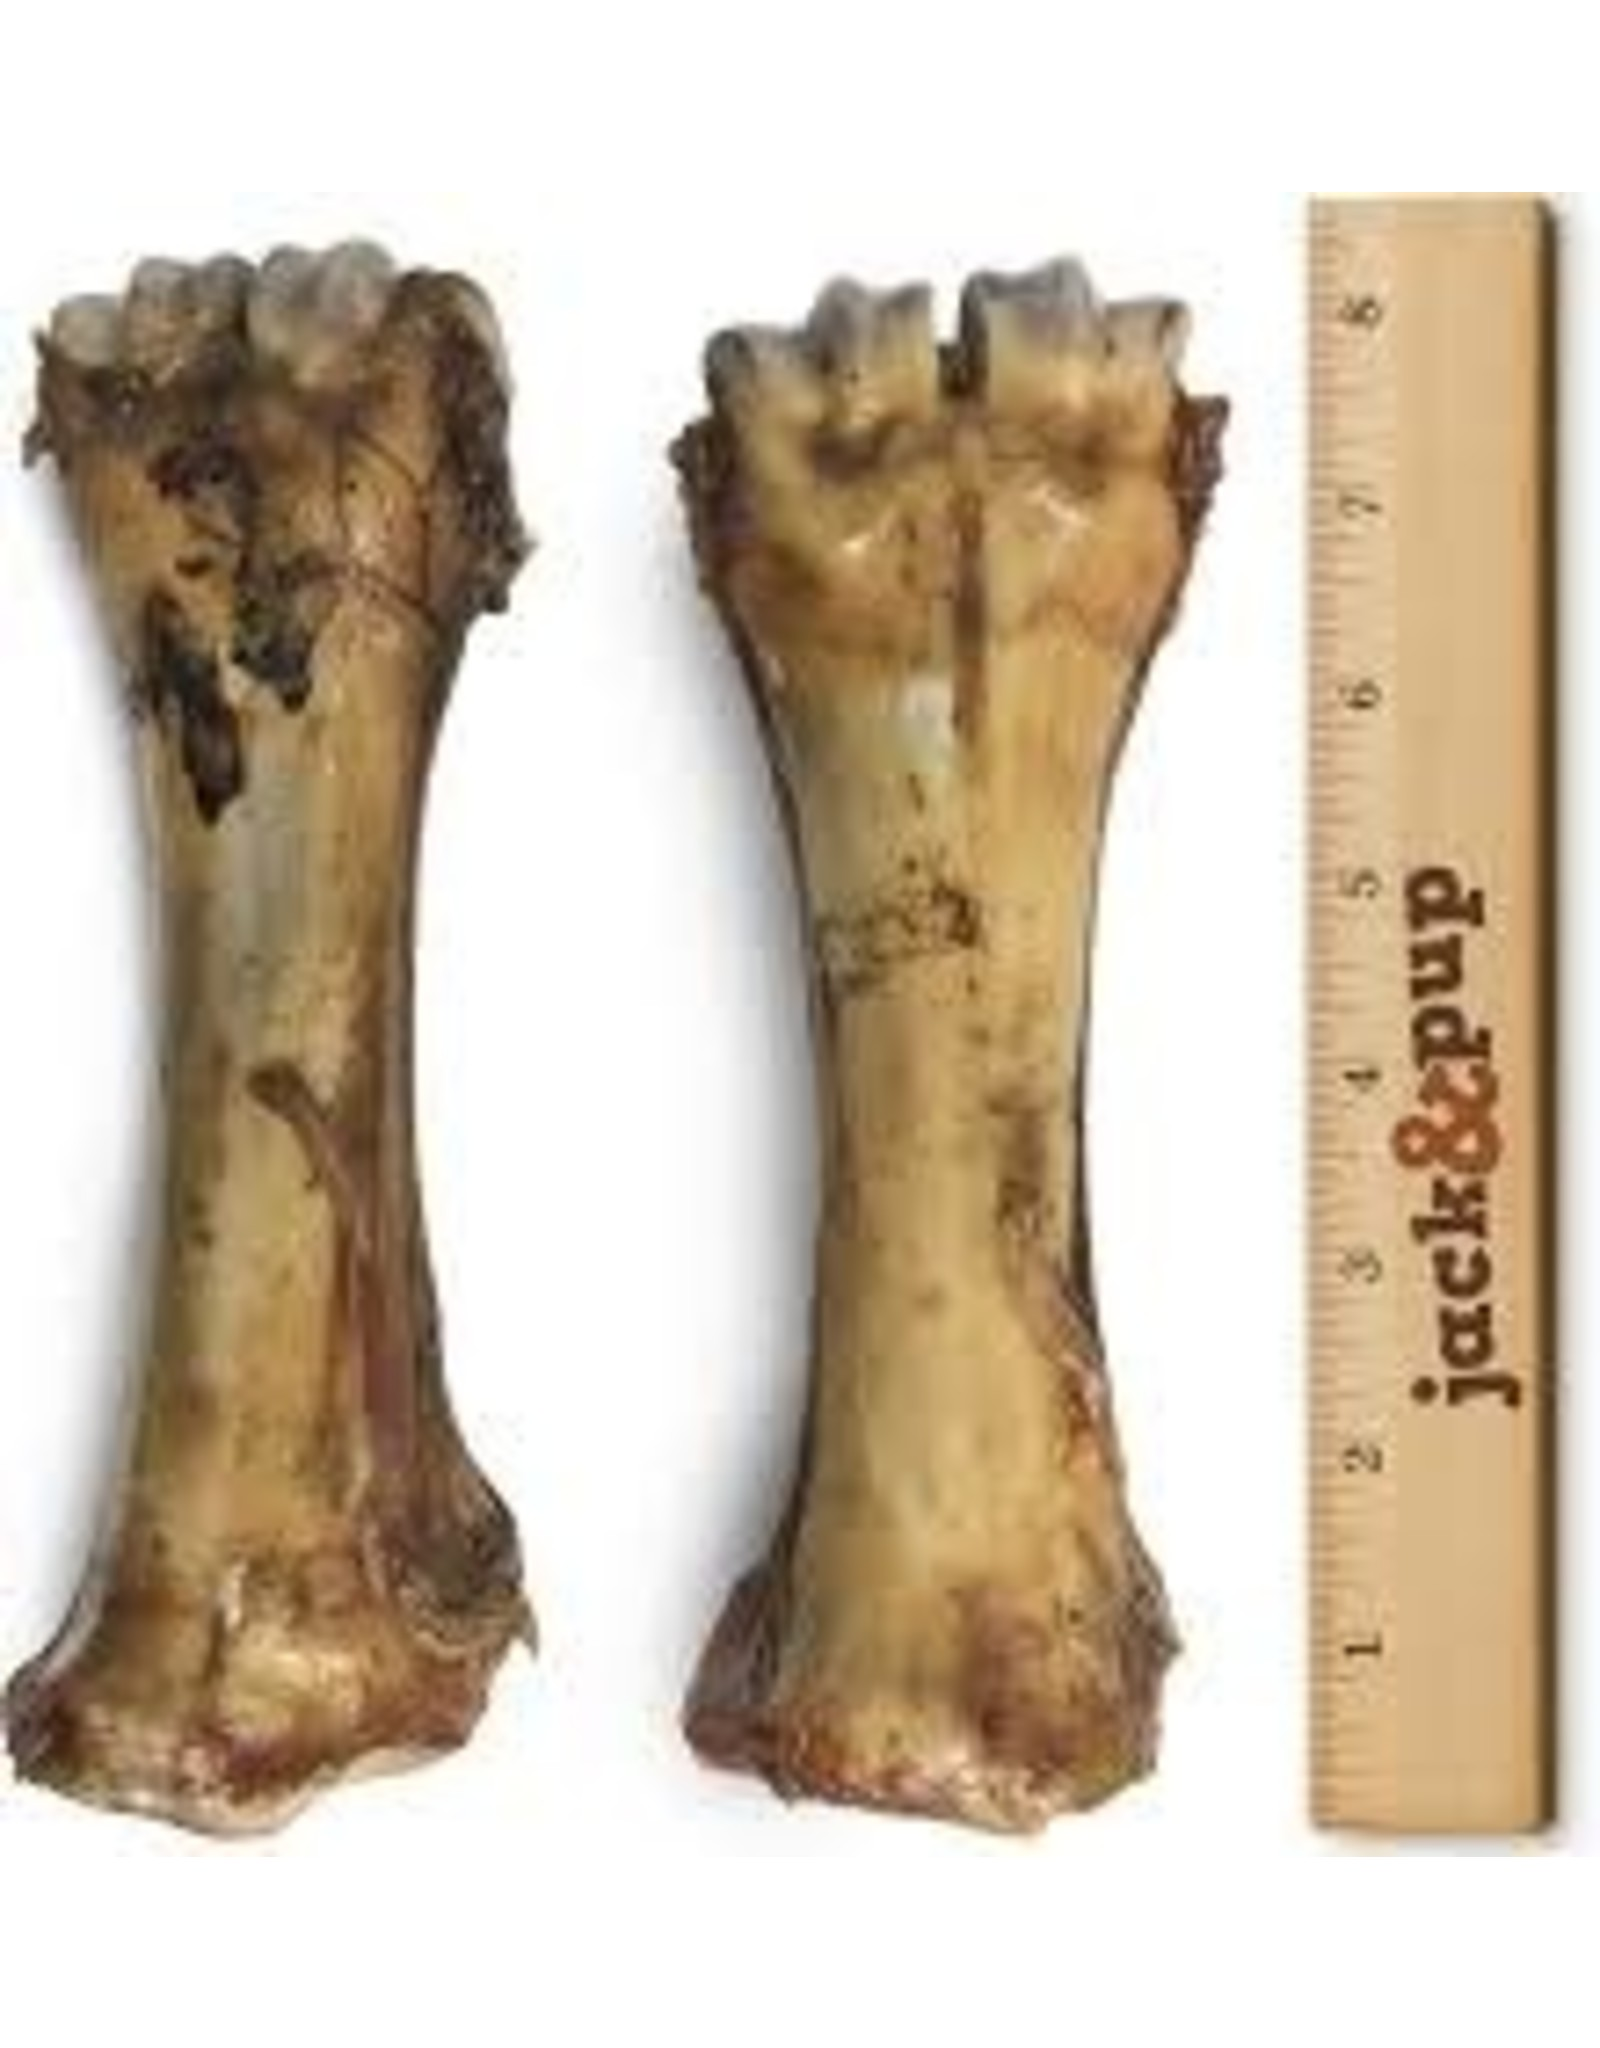 Jack & Pup Jack & Pup Shin Bone: 8 inch